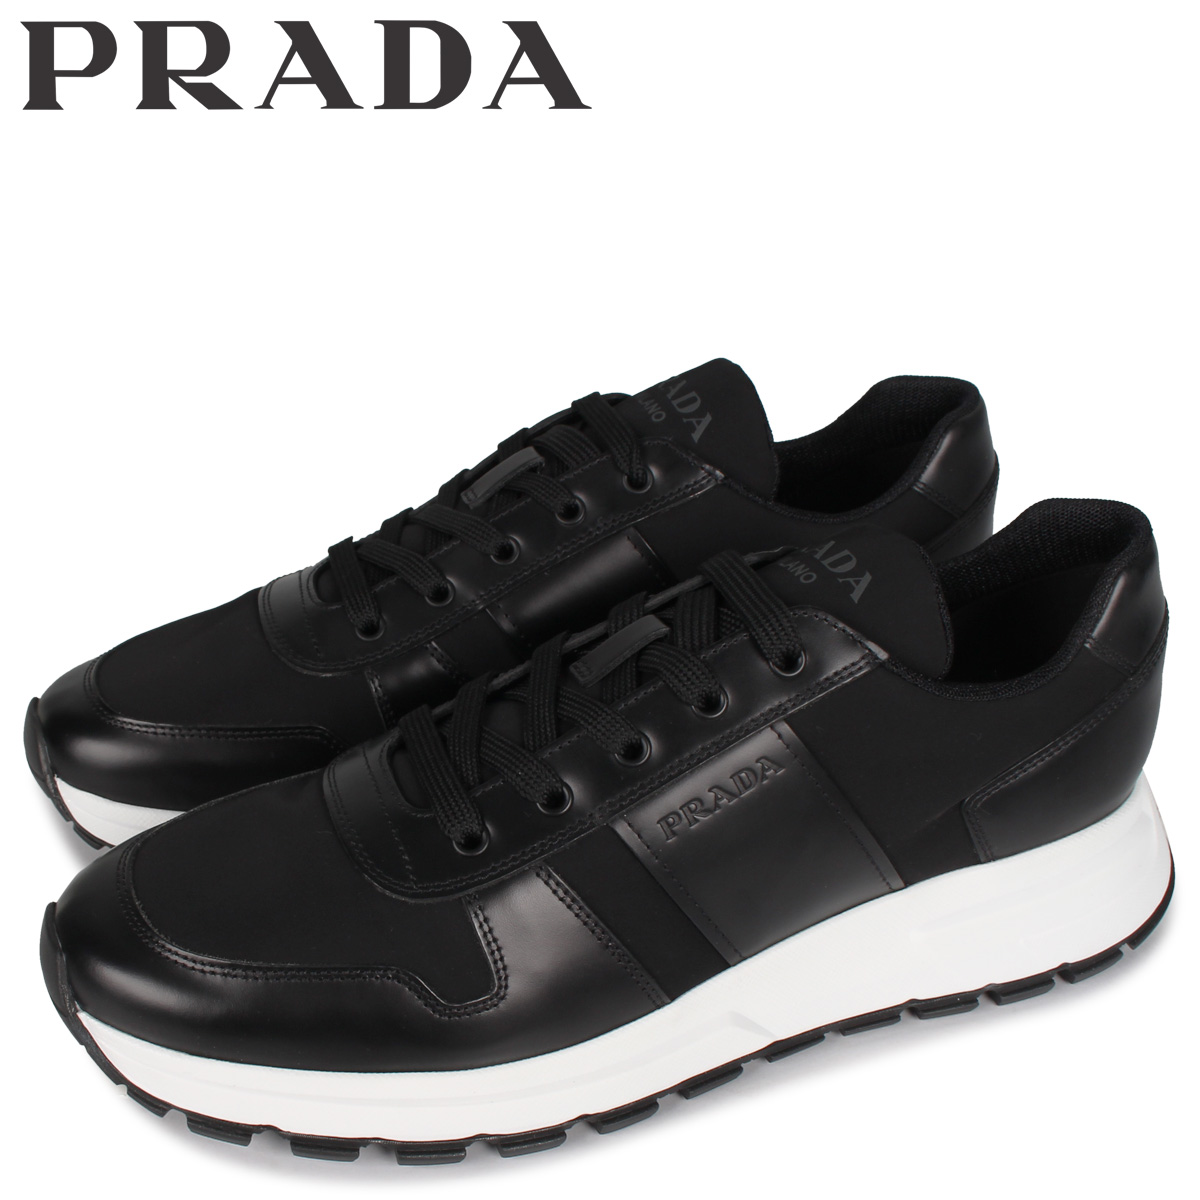 PRADA プラダ スニーカー メンズ PRAX 01 SNEAKER NYLON ブラック 黒 4E3463 [5/4 新入荷]